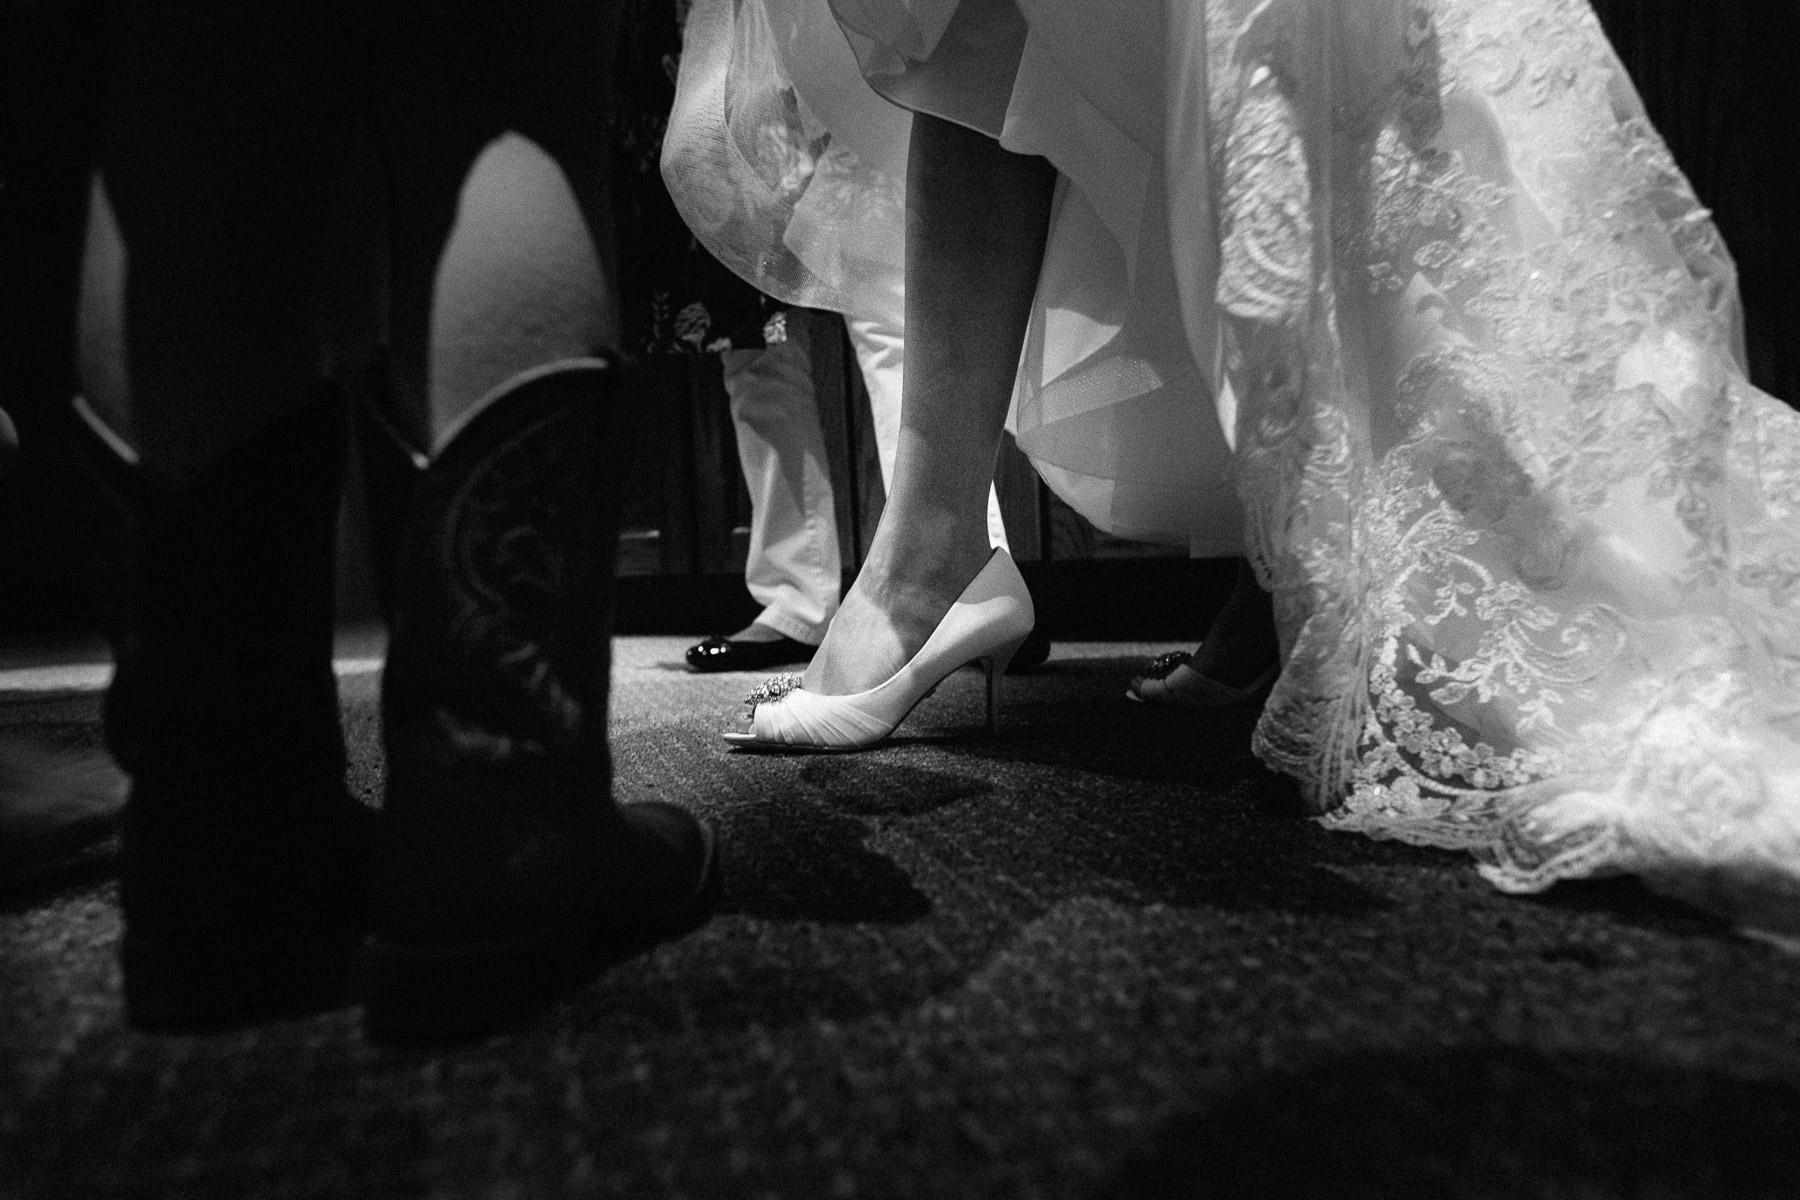 racquet-club-philadelphia-wedding-11.jpg